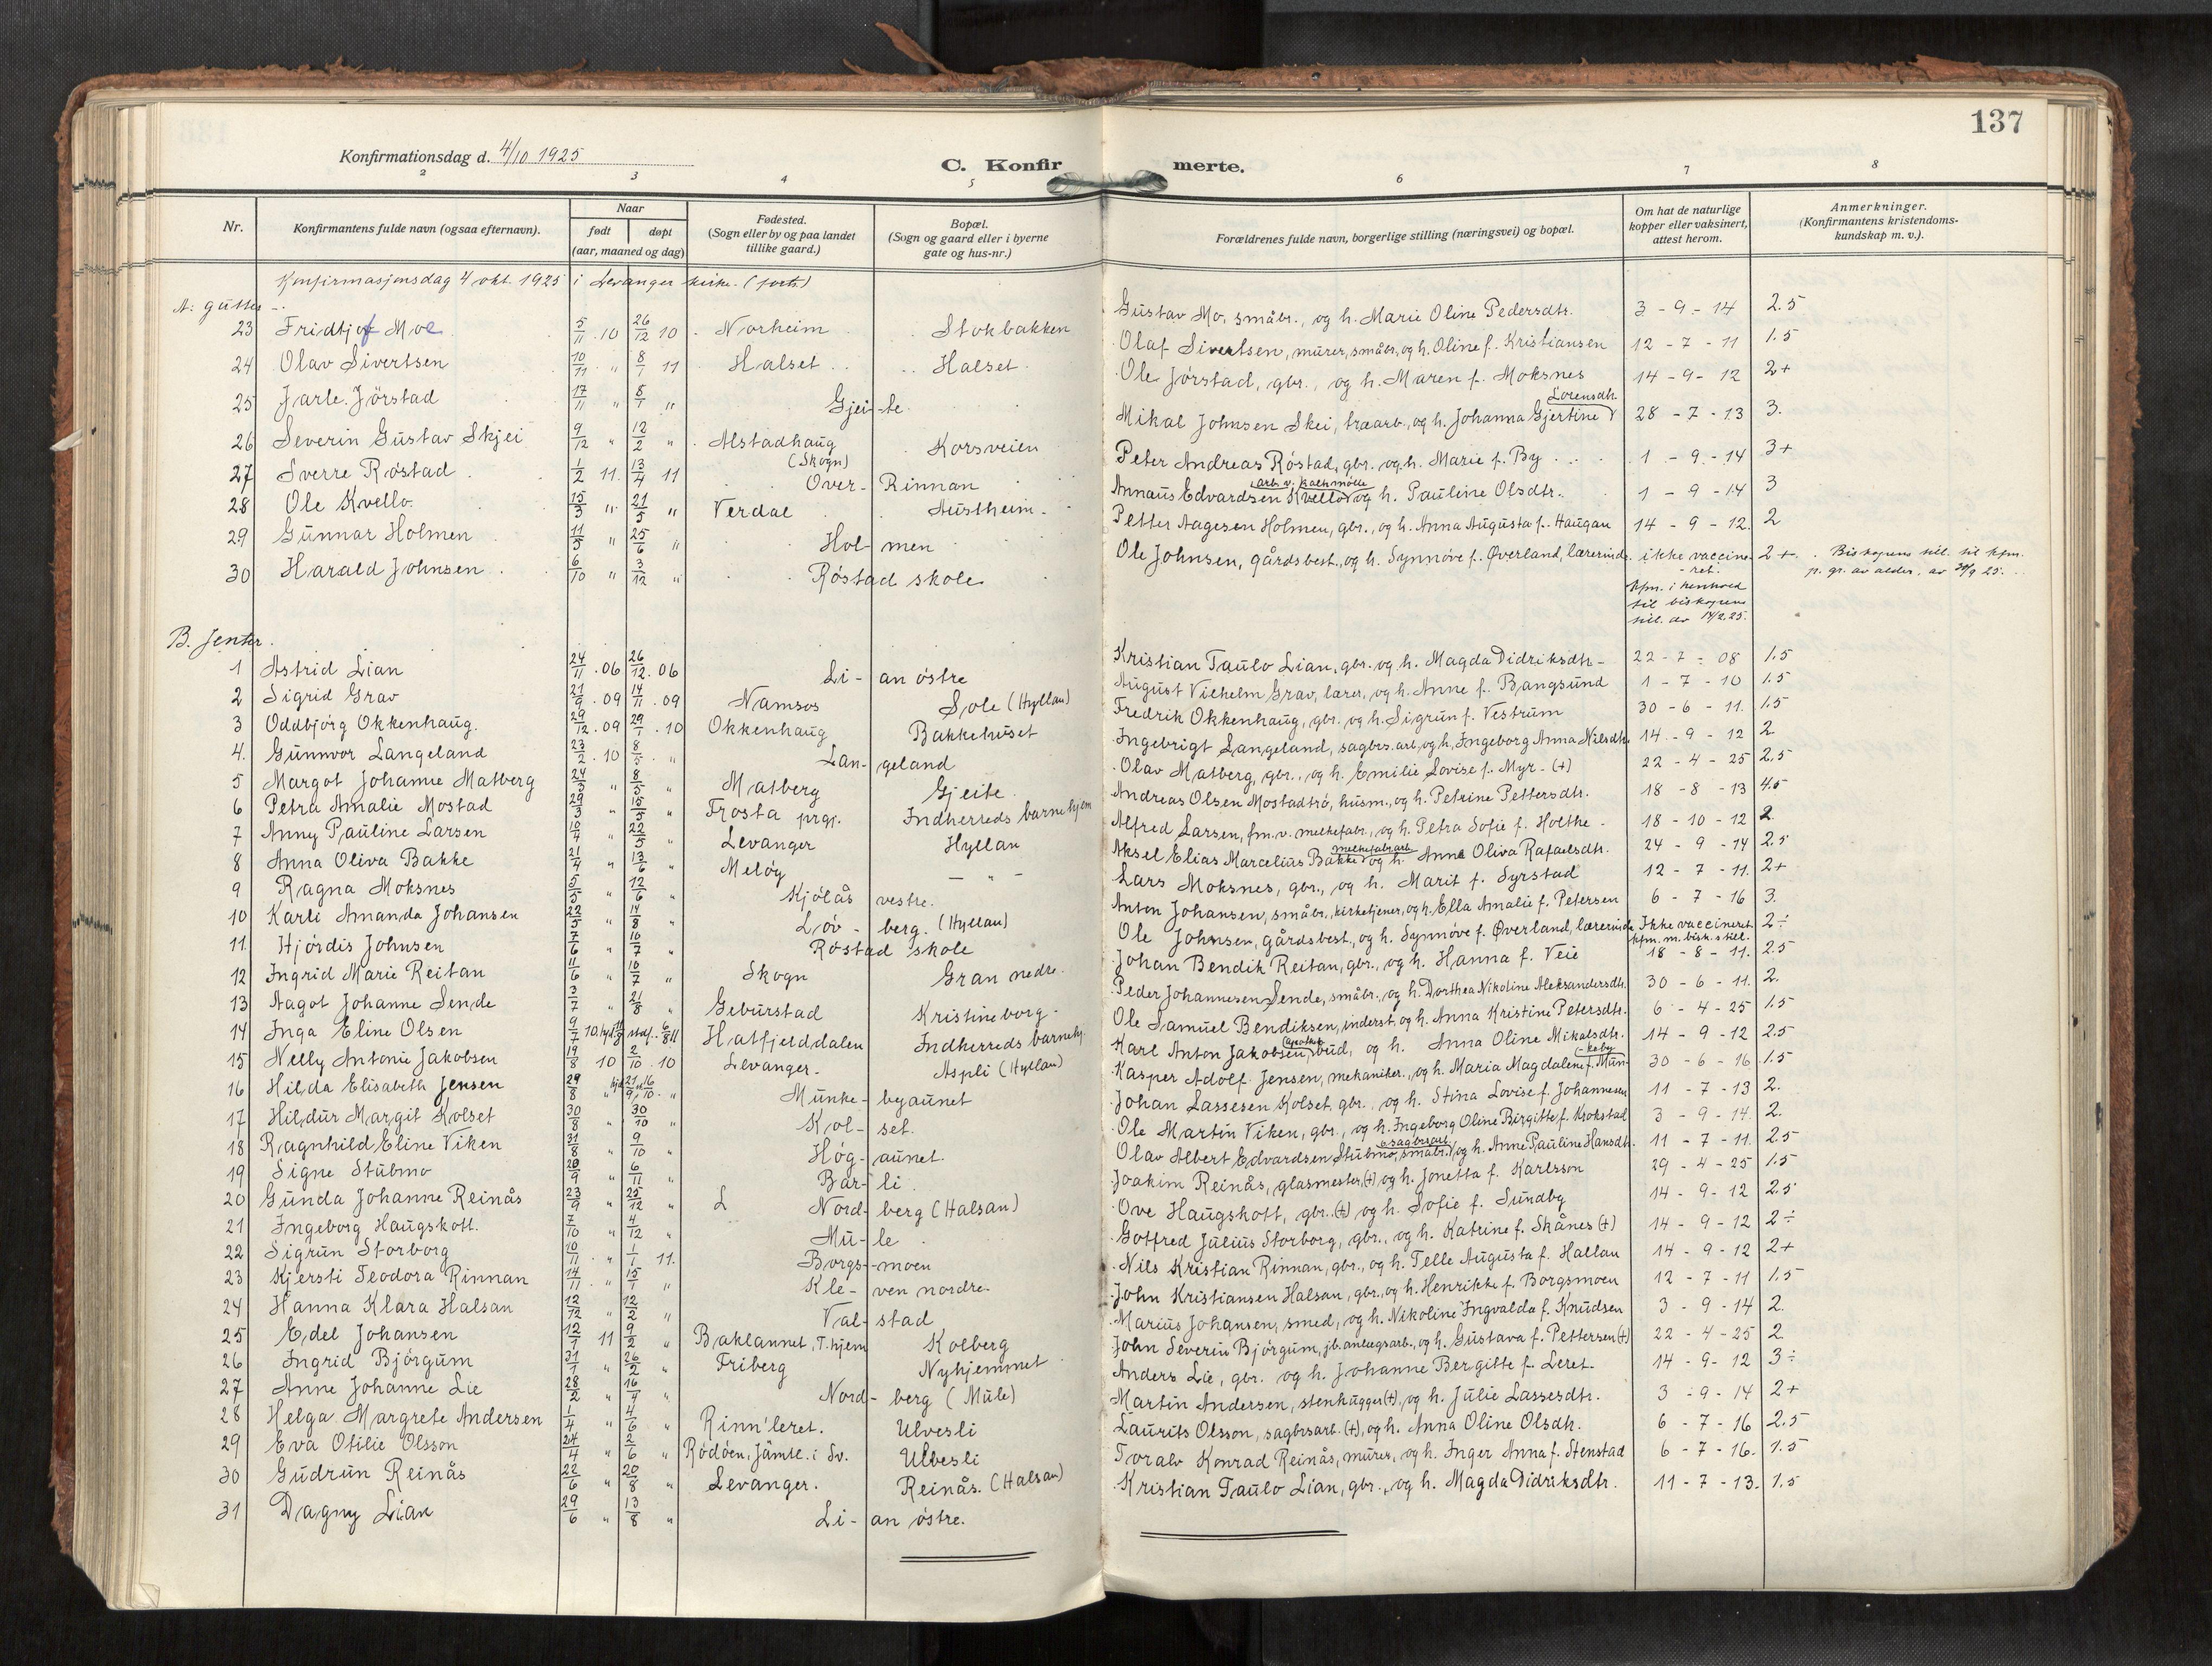 SAT, Levanger sokneprestkontor*, Parish register (official) no. 1, 1912-1935, p. 137